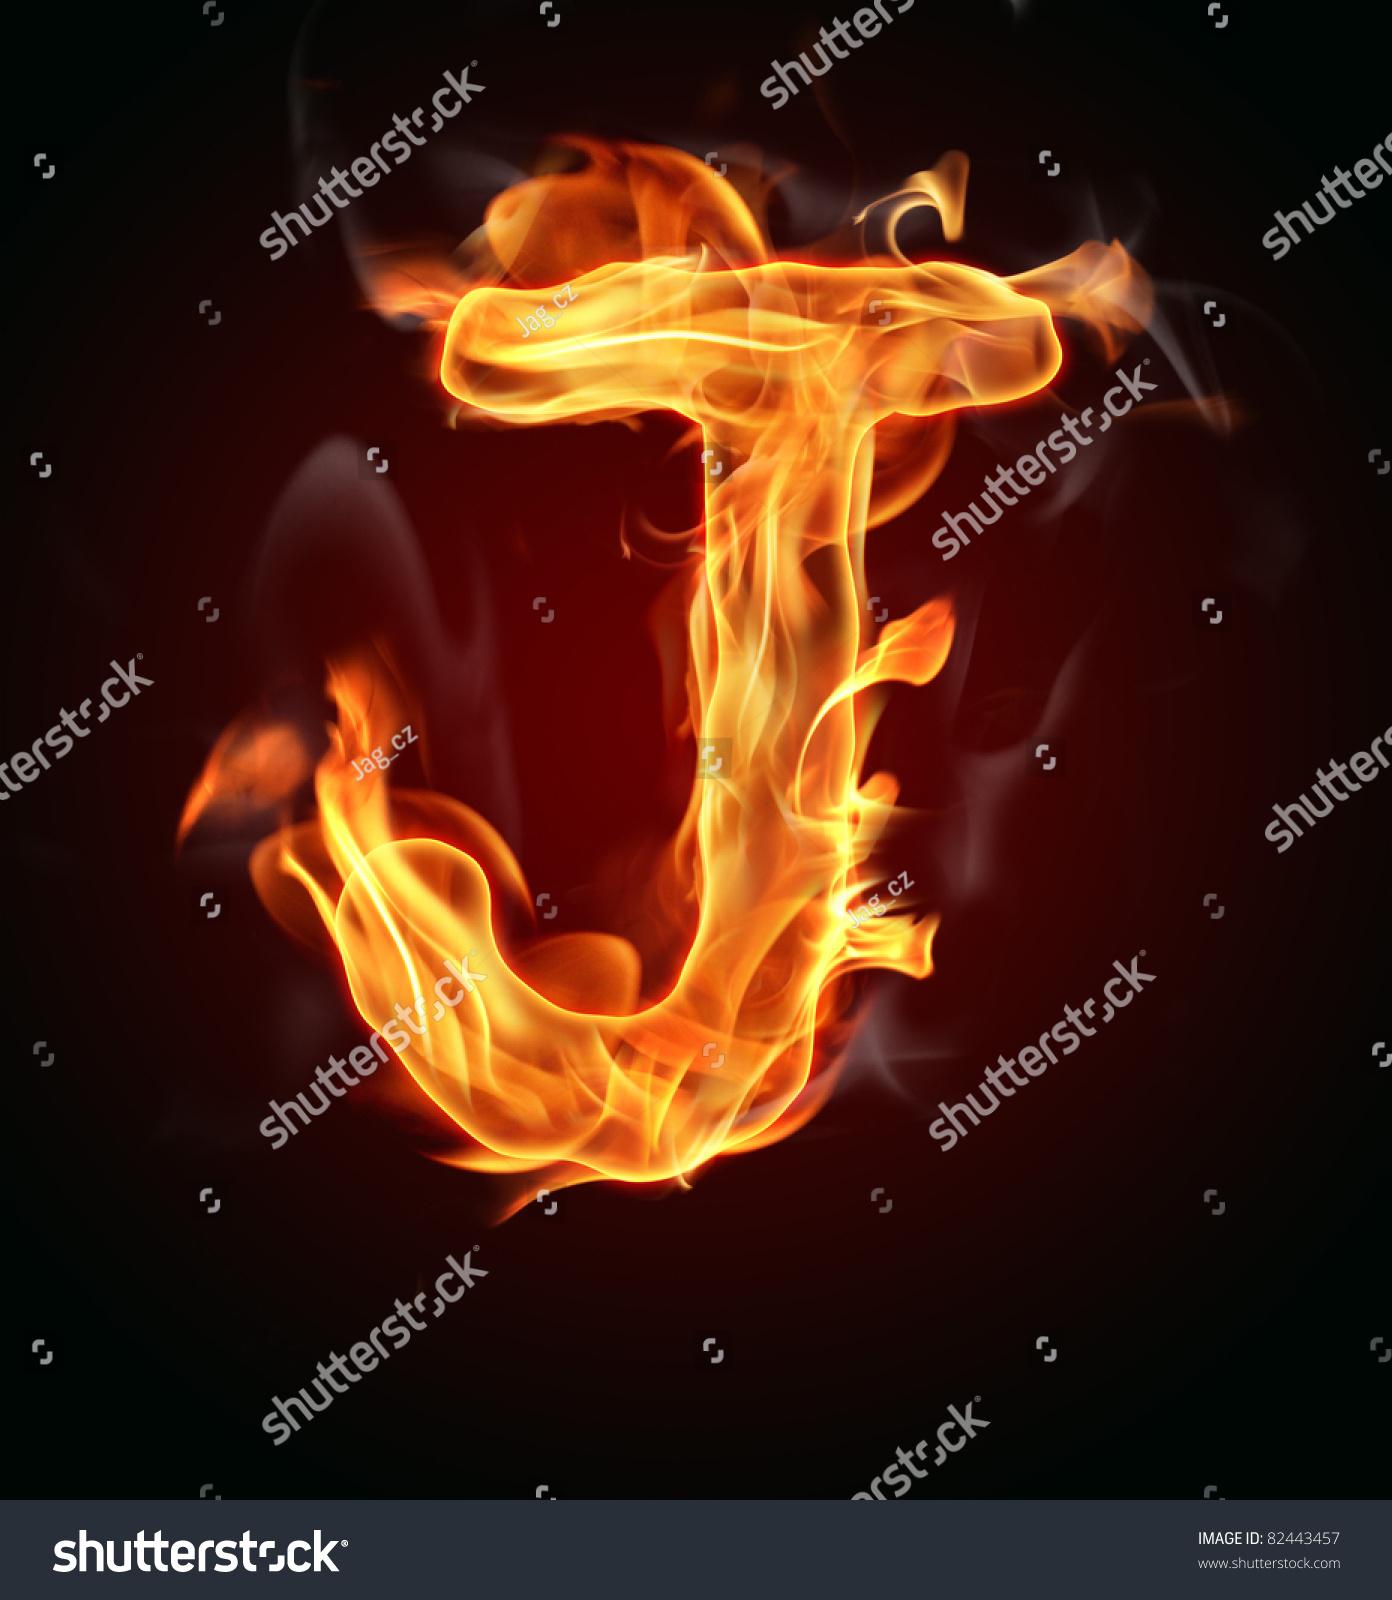 Letter J Logo Fire on Form An Alphabet View